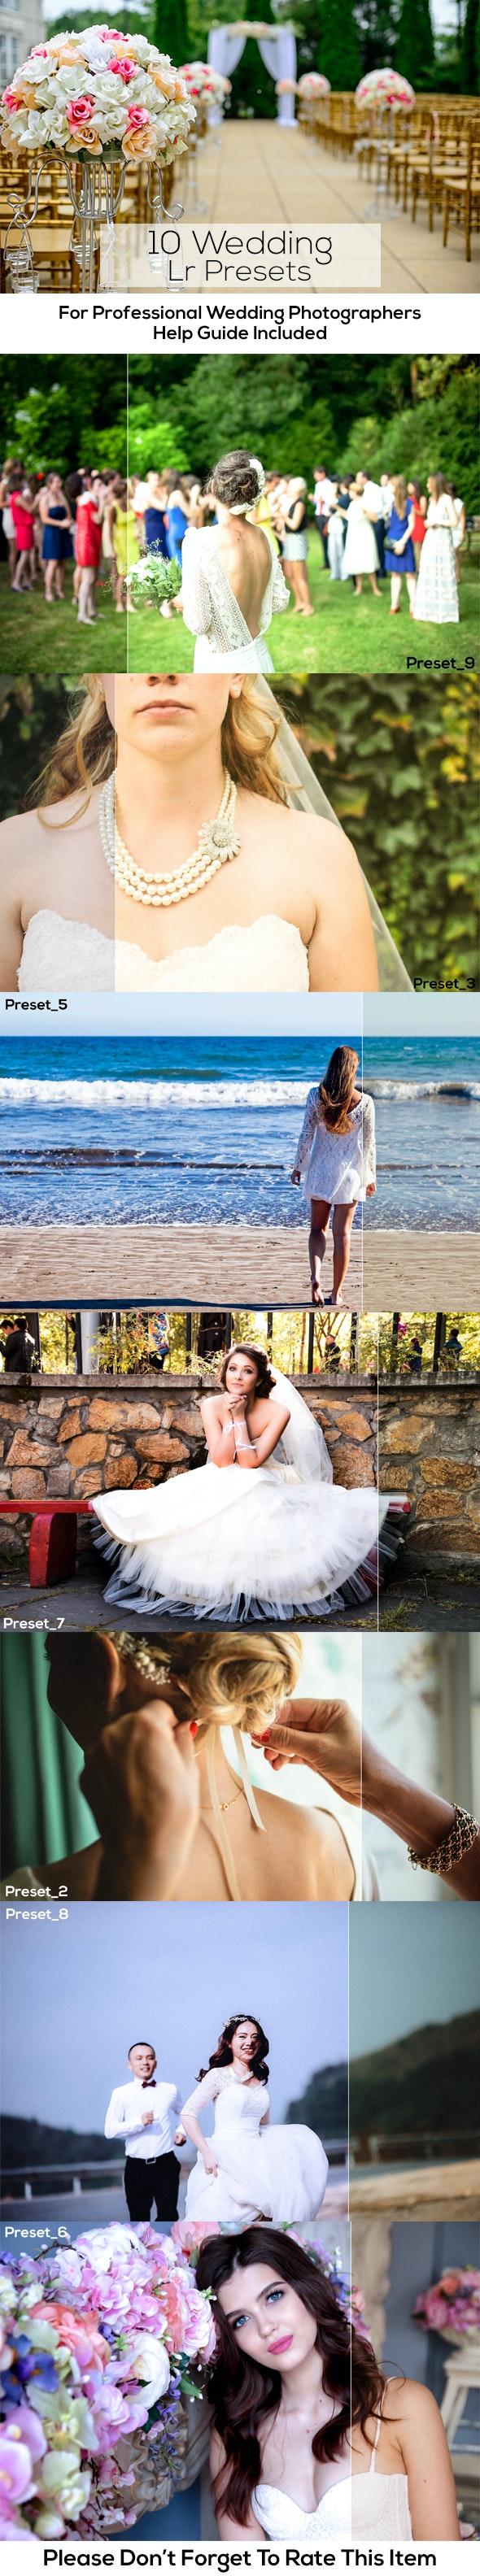 10 Wedding Lr Presets - Wedding Lightroom Presets